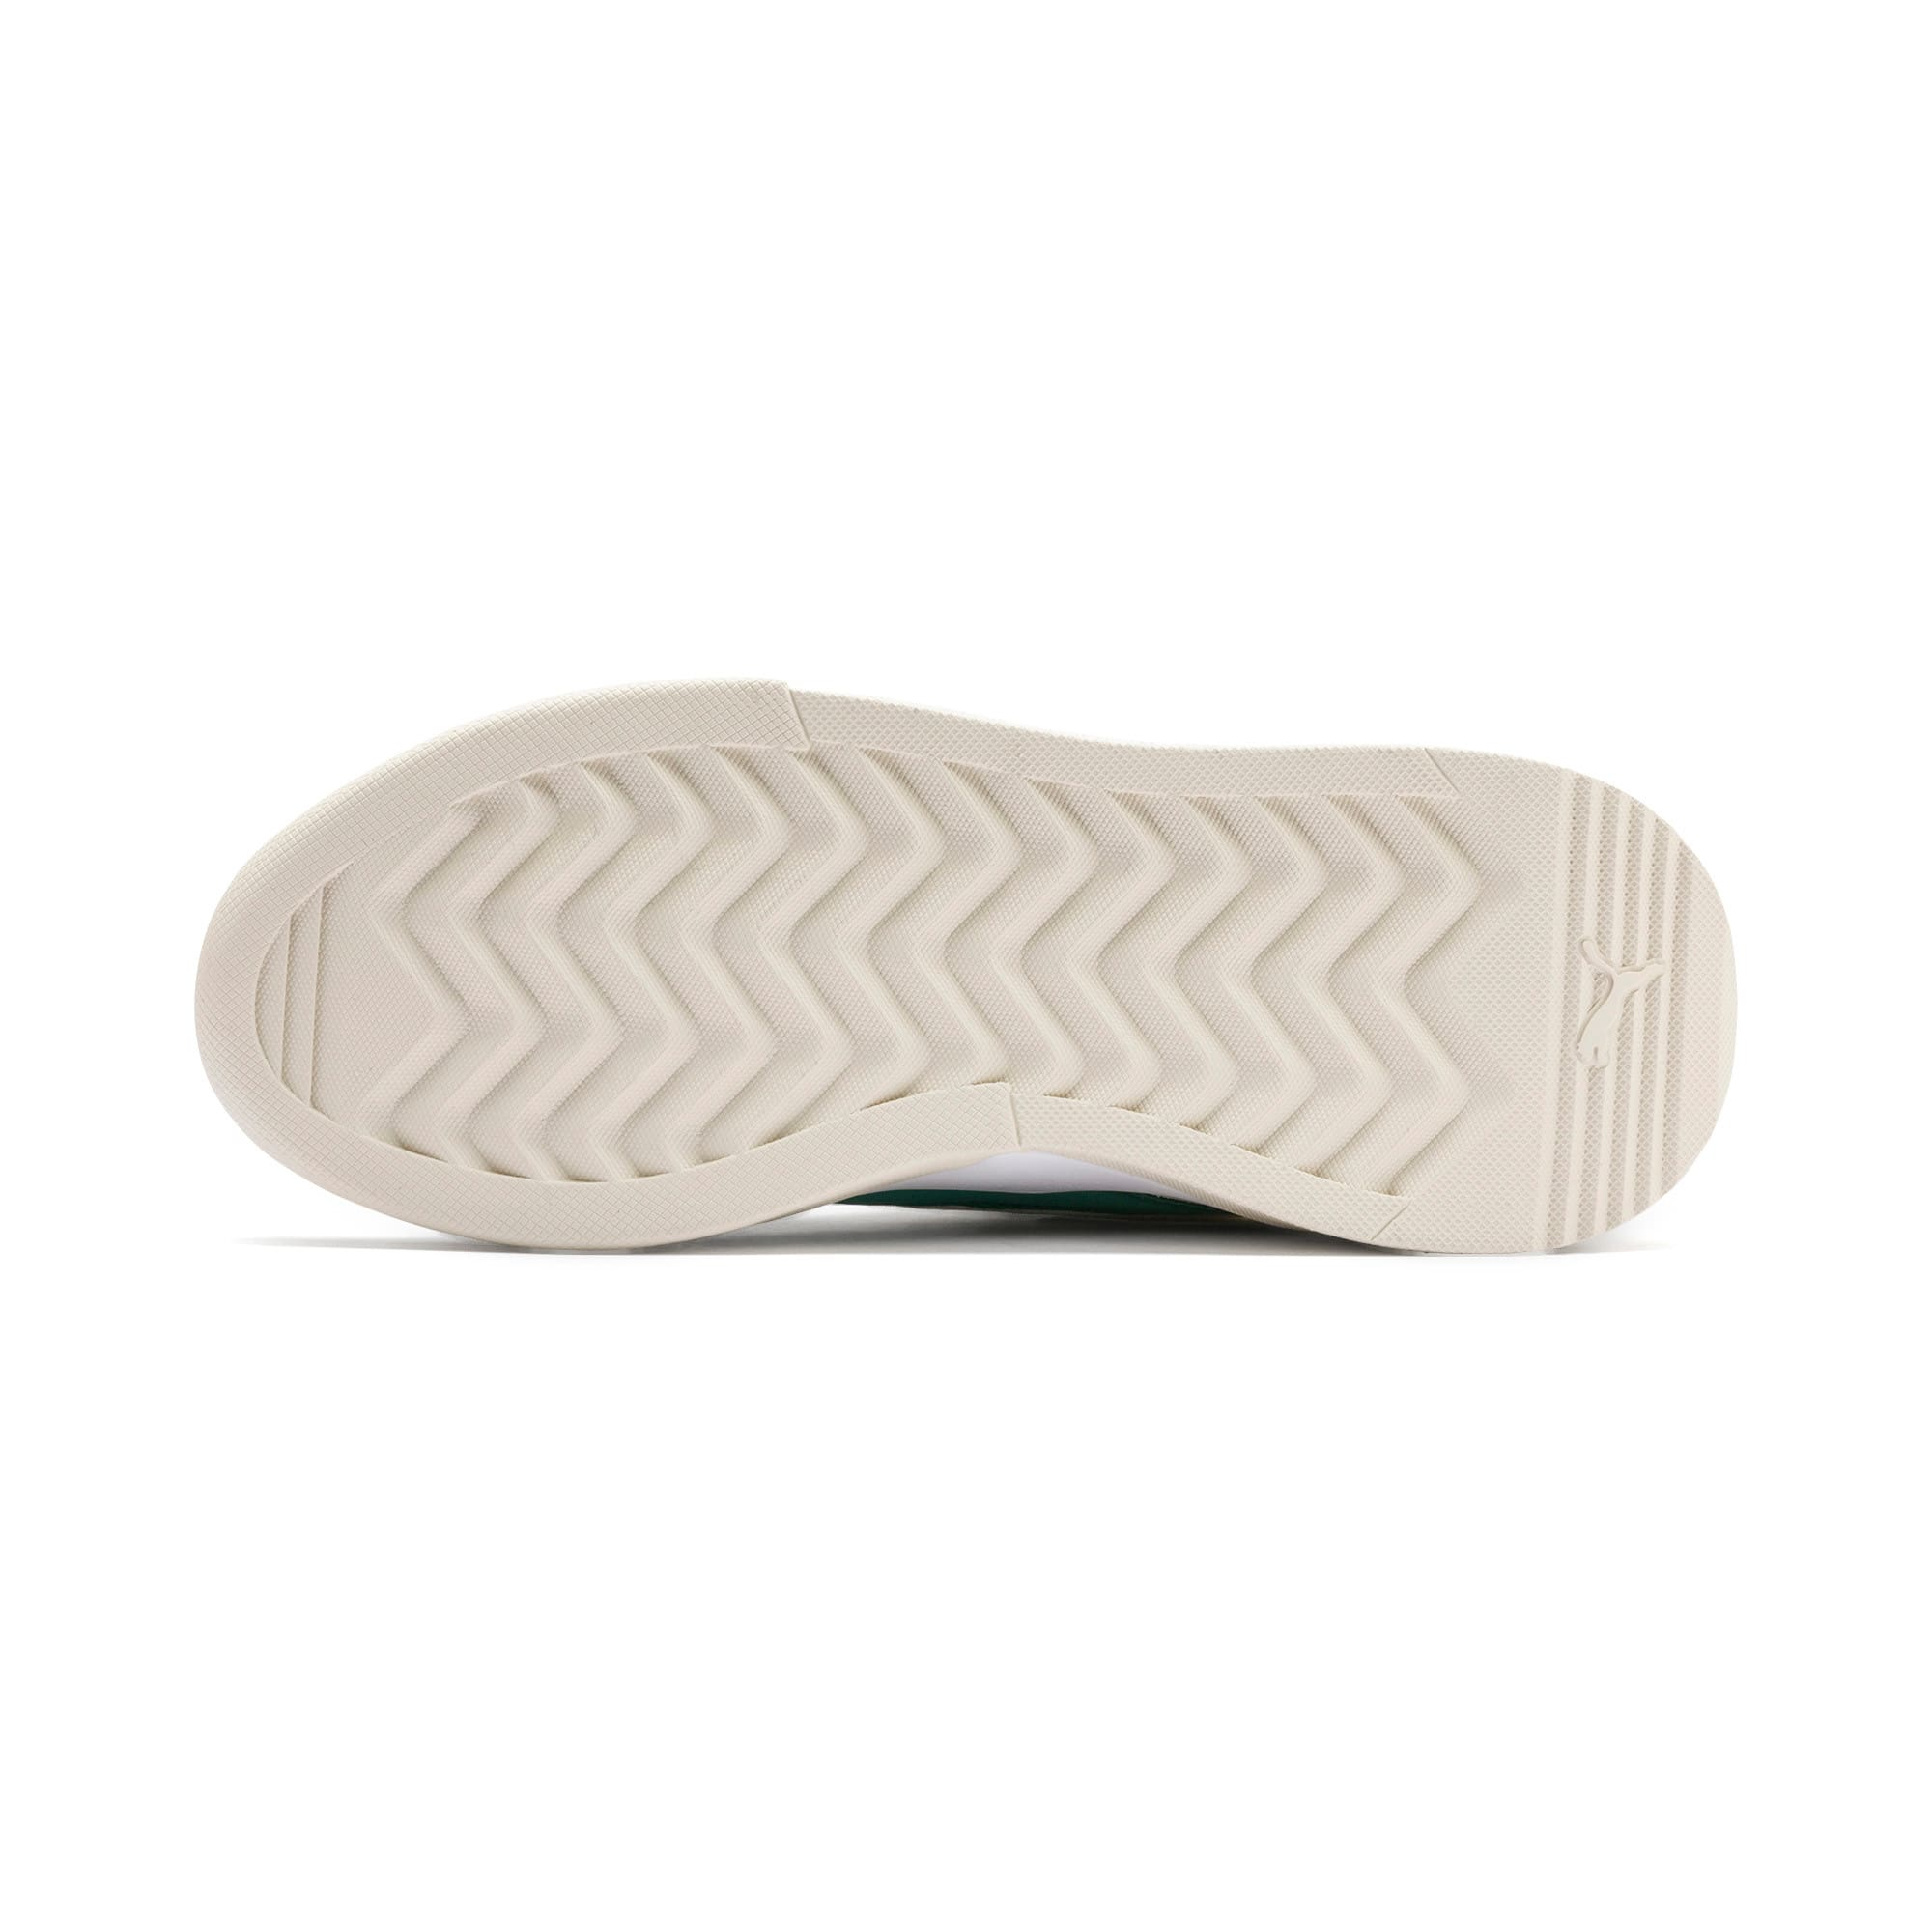 Thumbnail 5 of Aeon Heritage Women's Sneakers, Puma White-Teal Green, medium